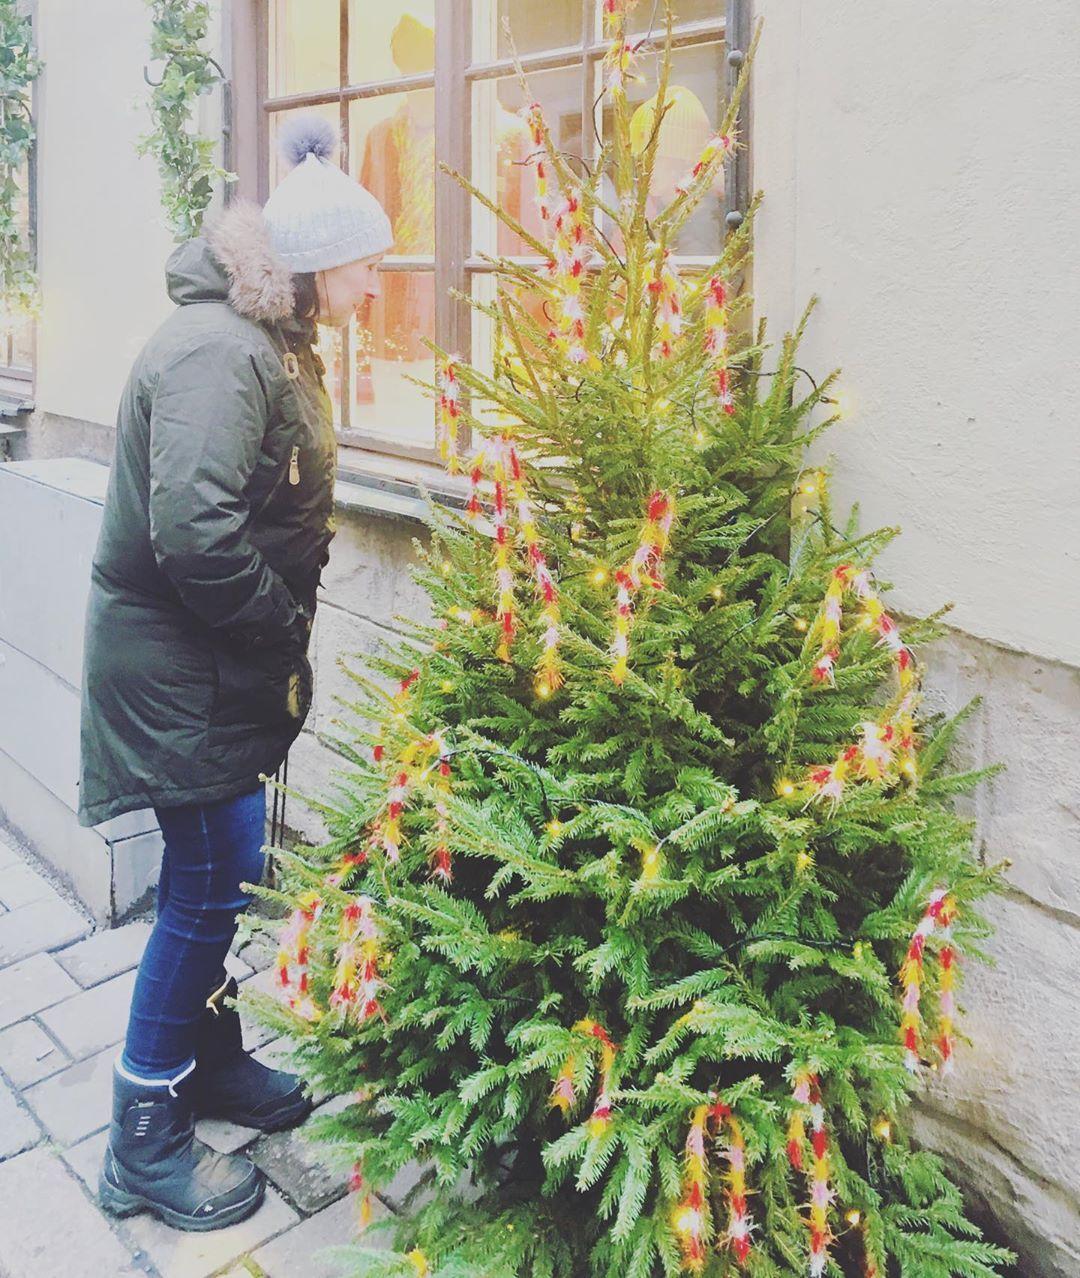 #oldtown #stockholm #stockholmchristmas #stockholmsweden #stockholm_insta #swede... #Christmas #christmasdecor #christmasdecorations #christmastree #holiday #instachristmas #instagood